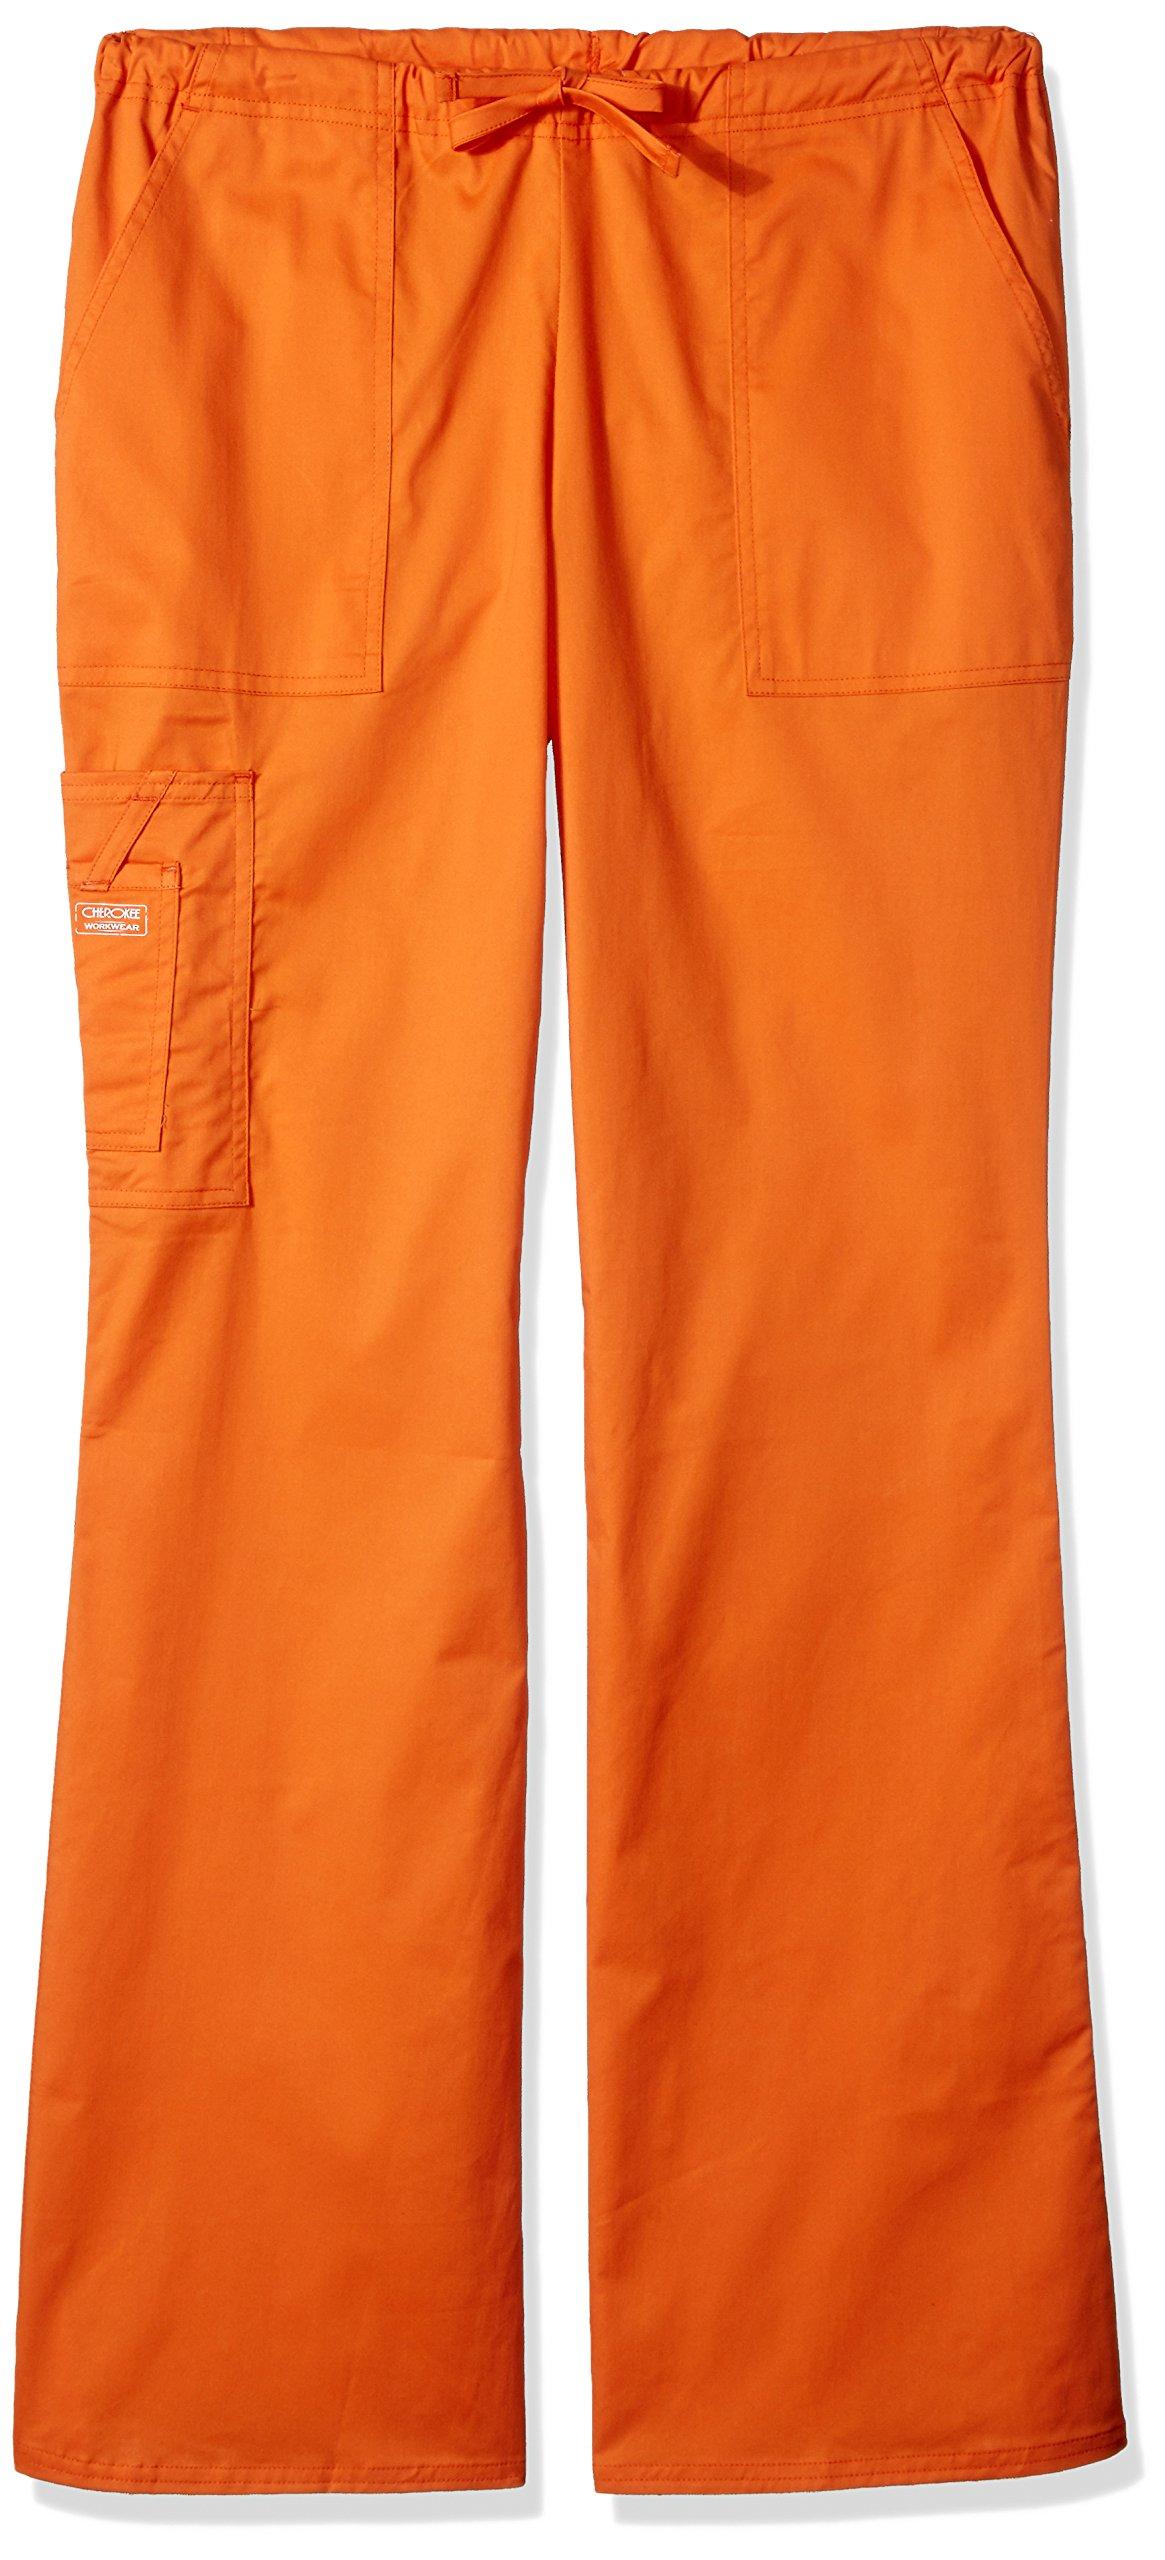 Cherokee Women's Workwear Core Stretch Drawstring Cargo Scrubs Pant, Pumpkin, X-Large Tall